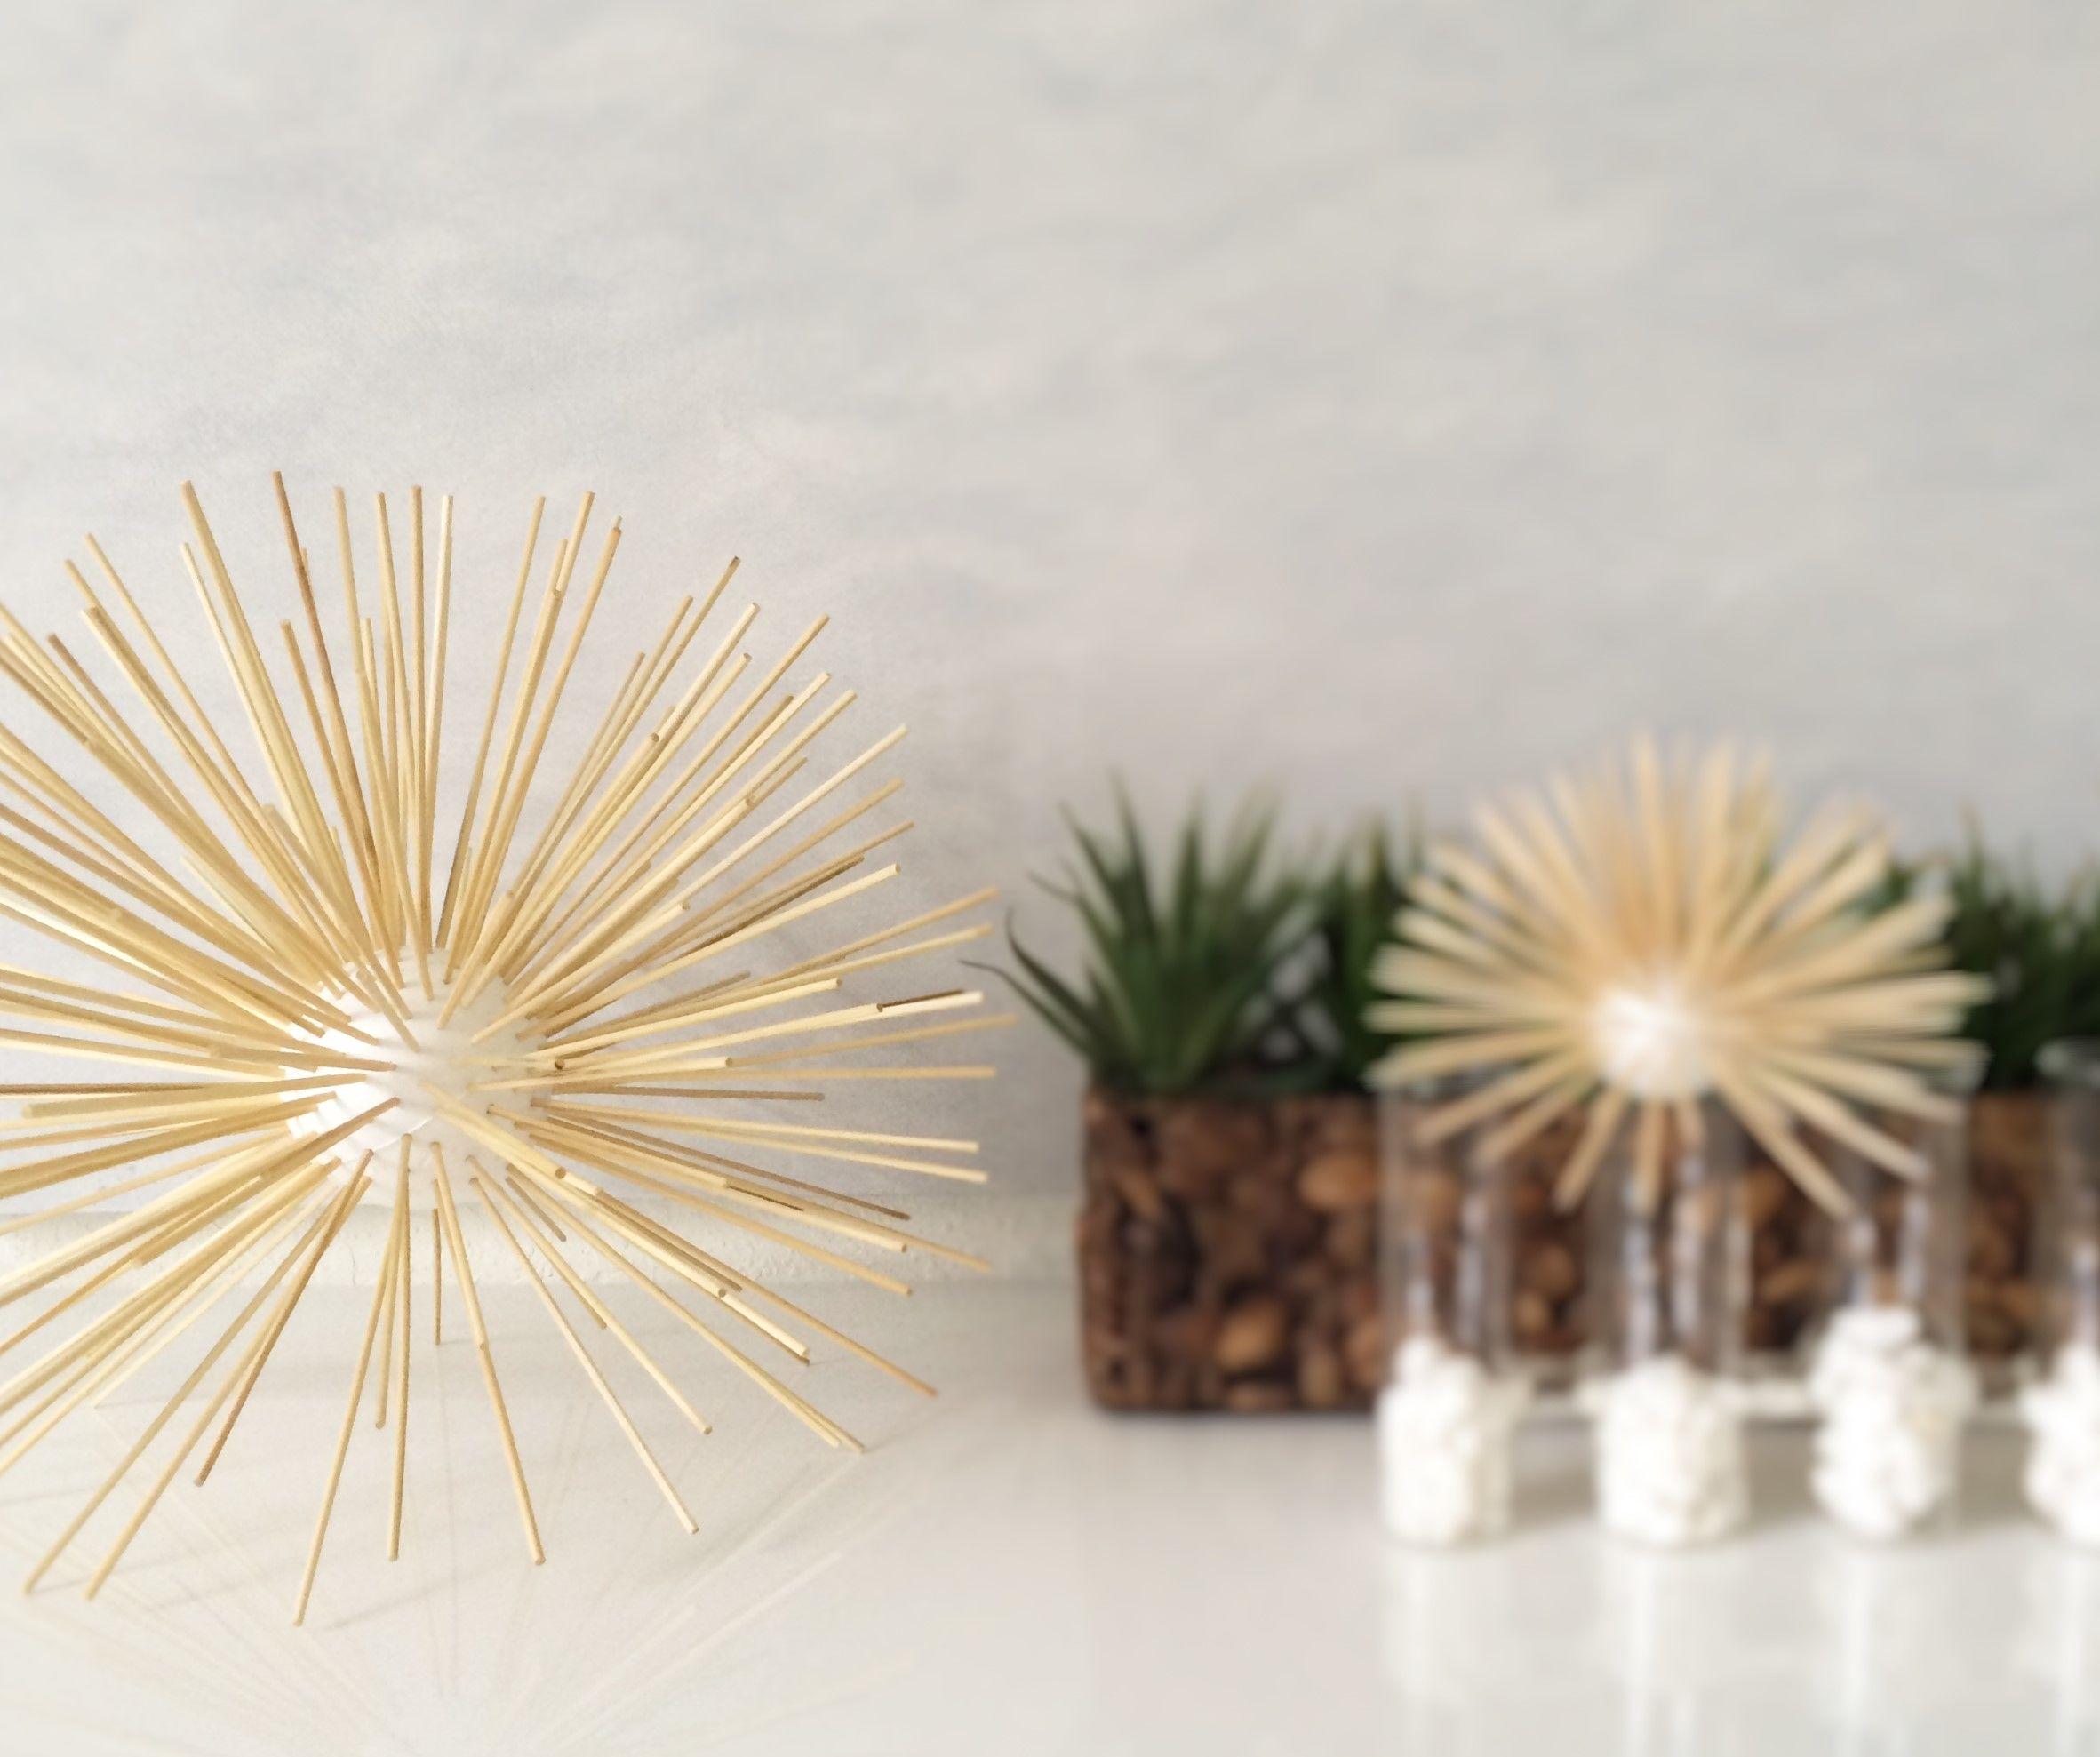 Decorative Sea Urchin